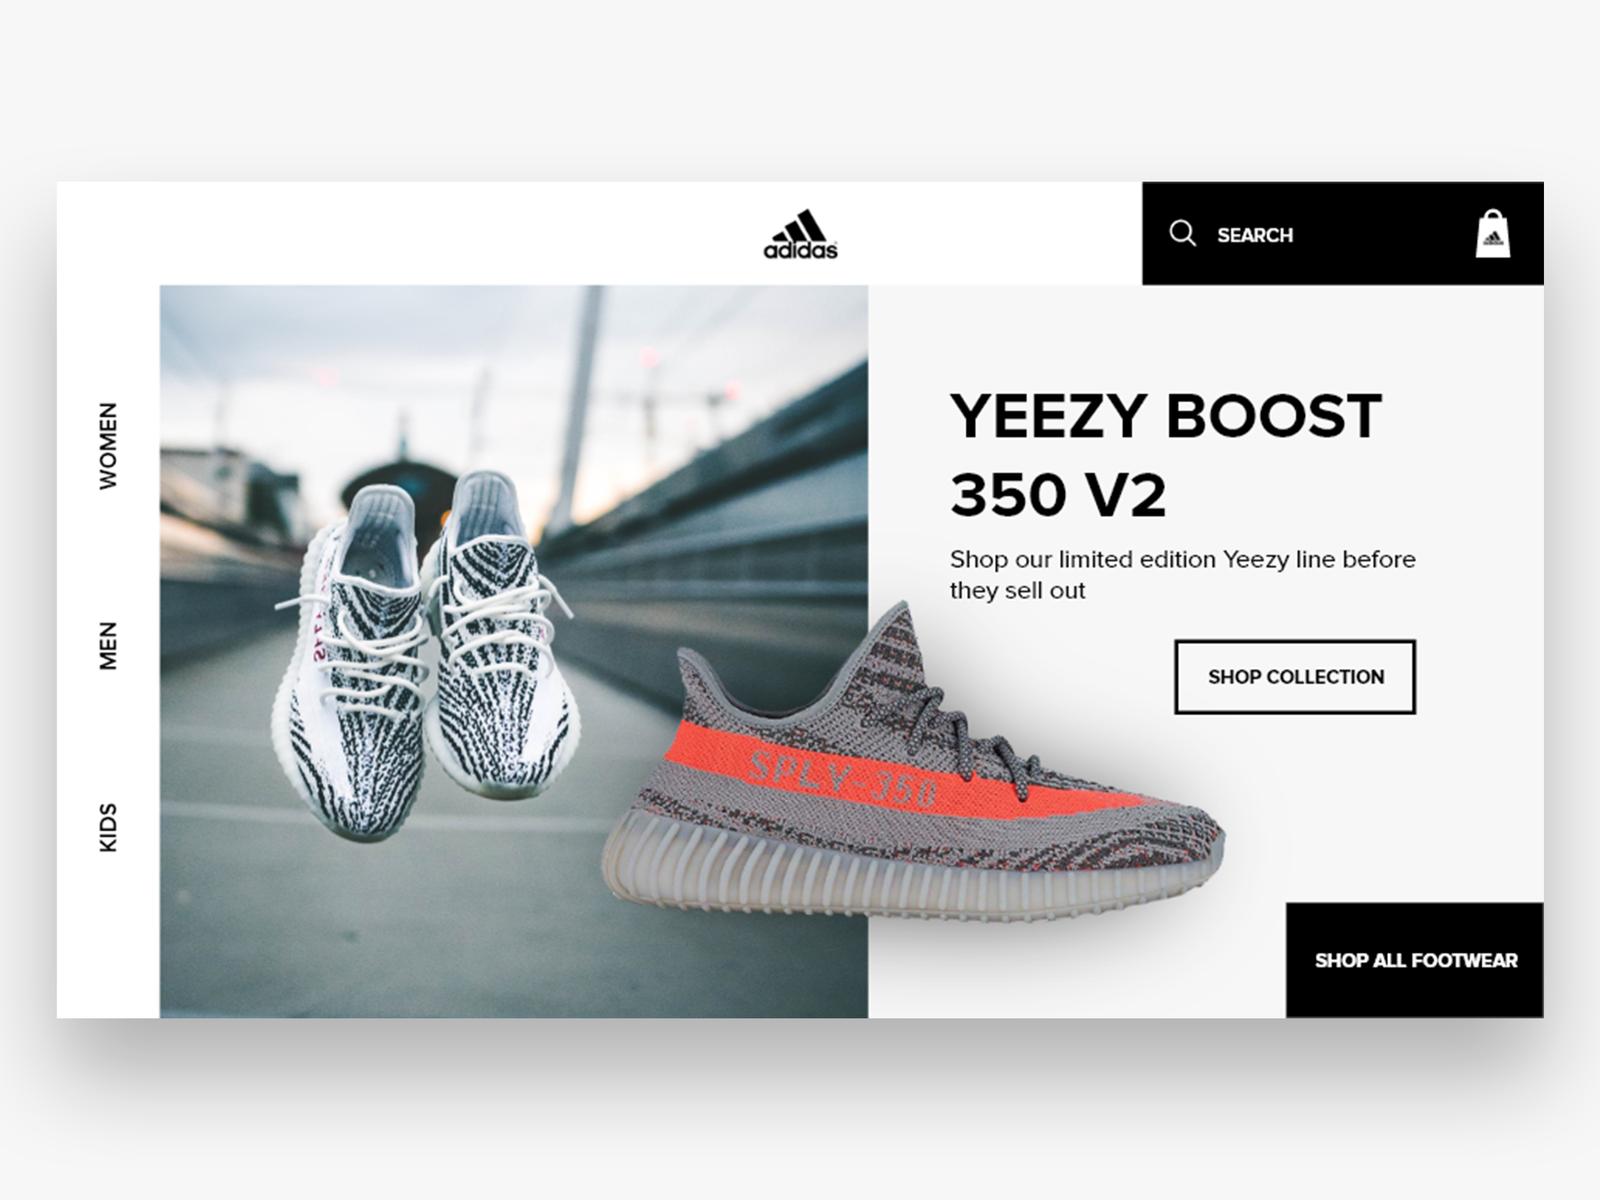 Adidas Website designs, themes